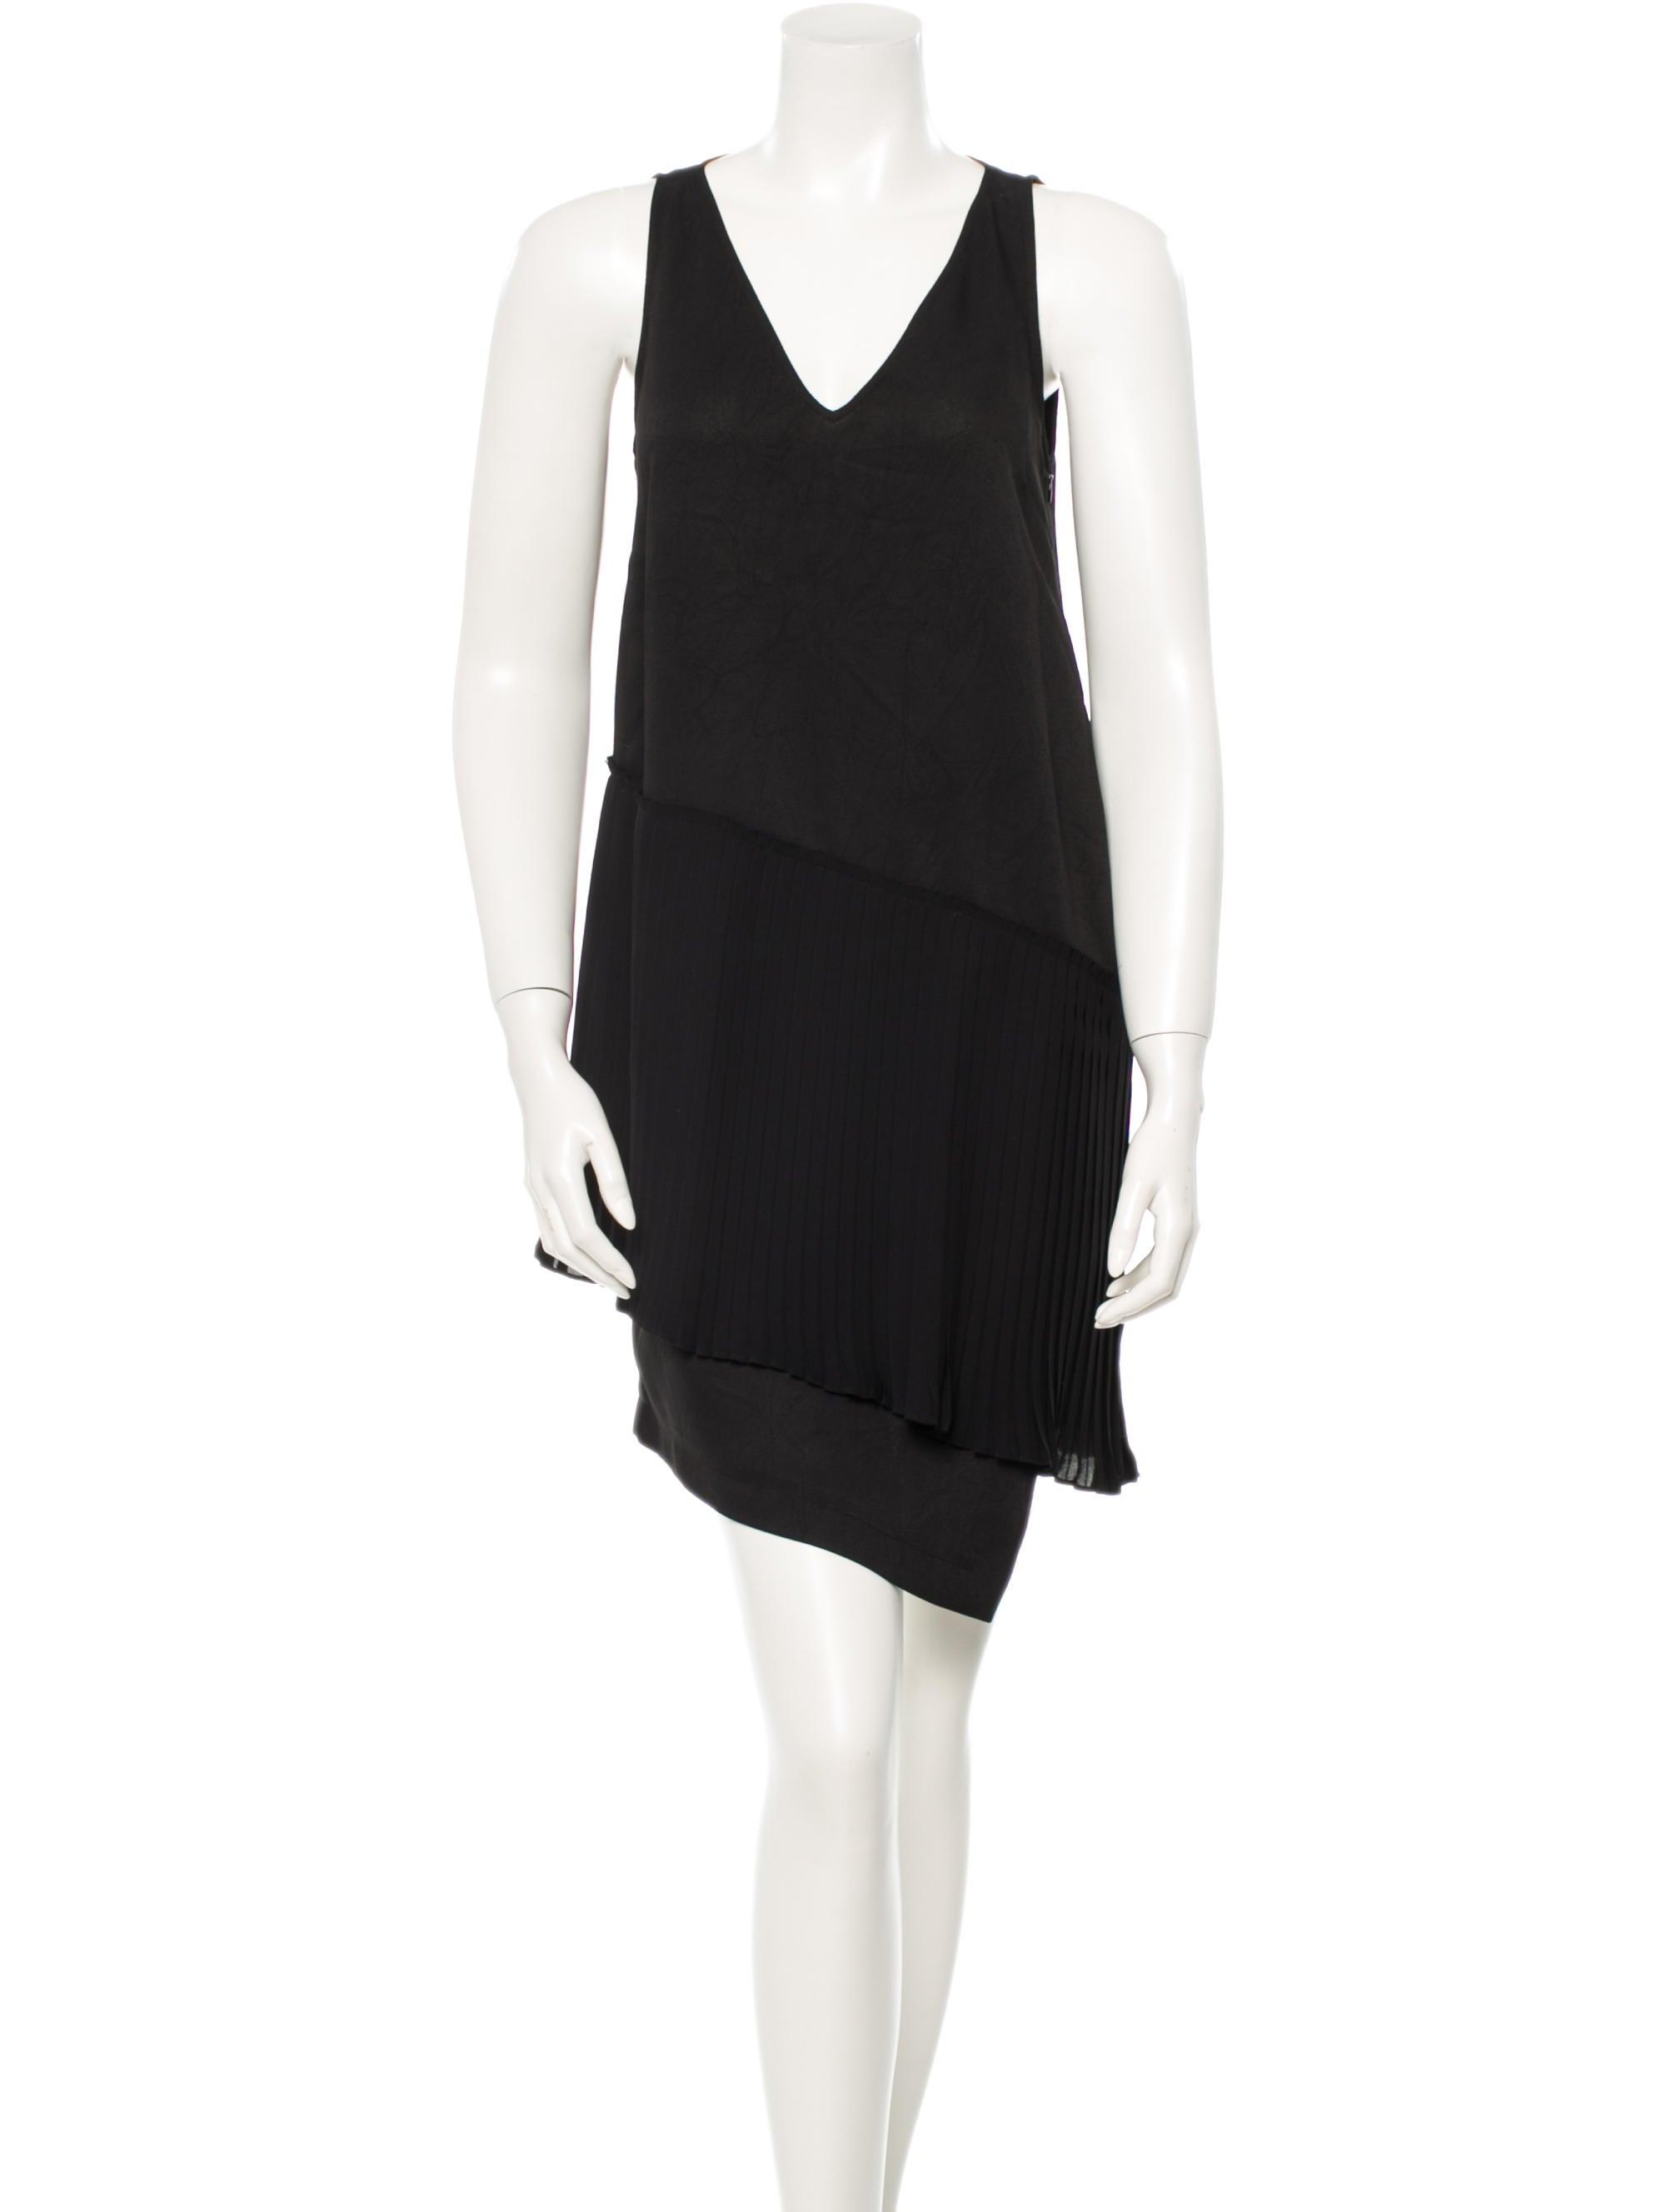 10 Crosby Derek Lam Dress Clothing Wdl21240 The Realreal